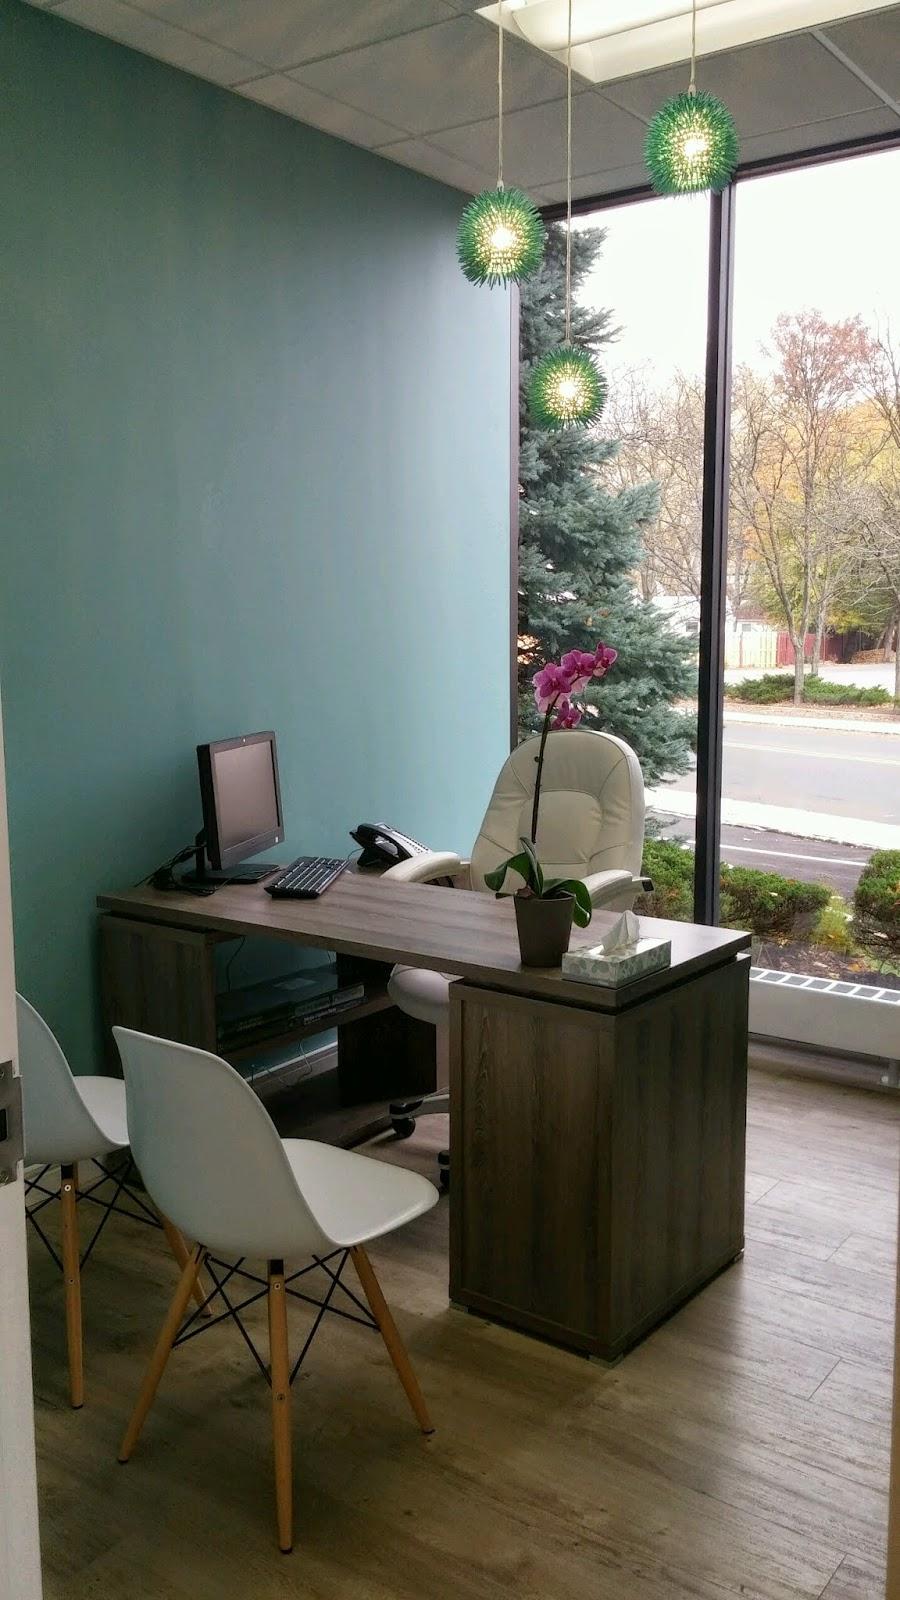 Precious Pearls Pediatric Dentistry - dentist  | Photo 8 of 10 | Address: 140 Mountain Ave #102, Springfield, NJ 07081, USA | Phone: (973) 232-5448